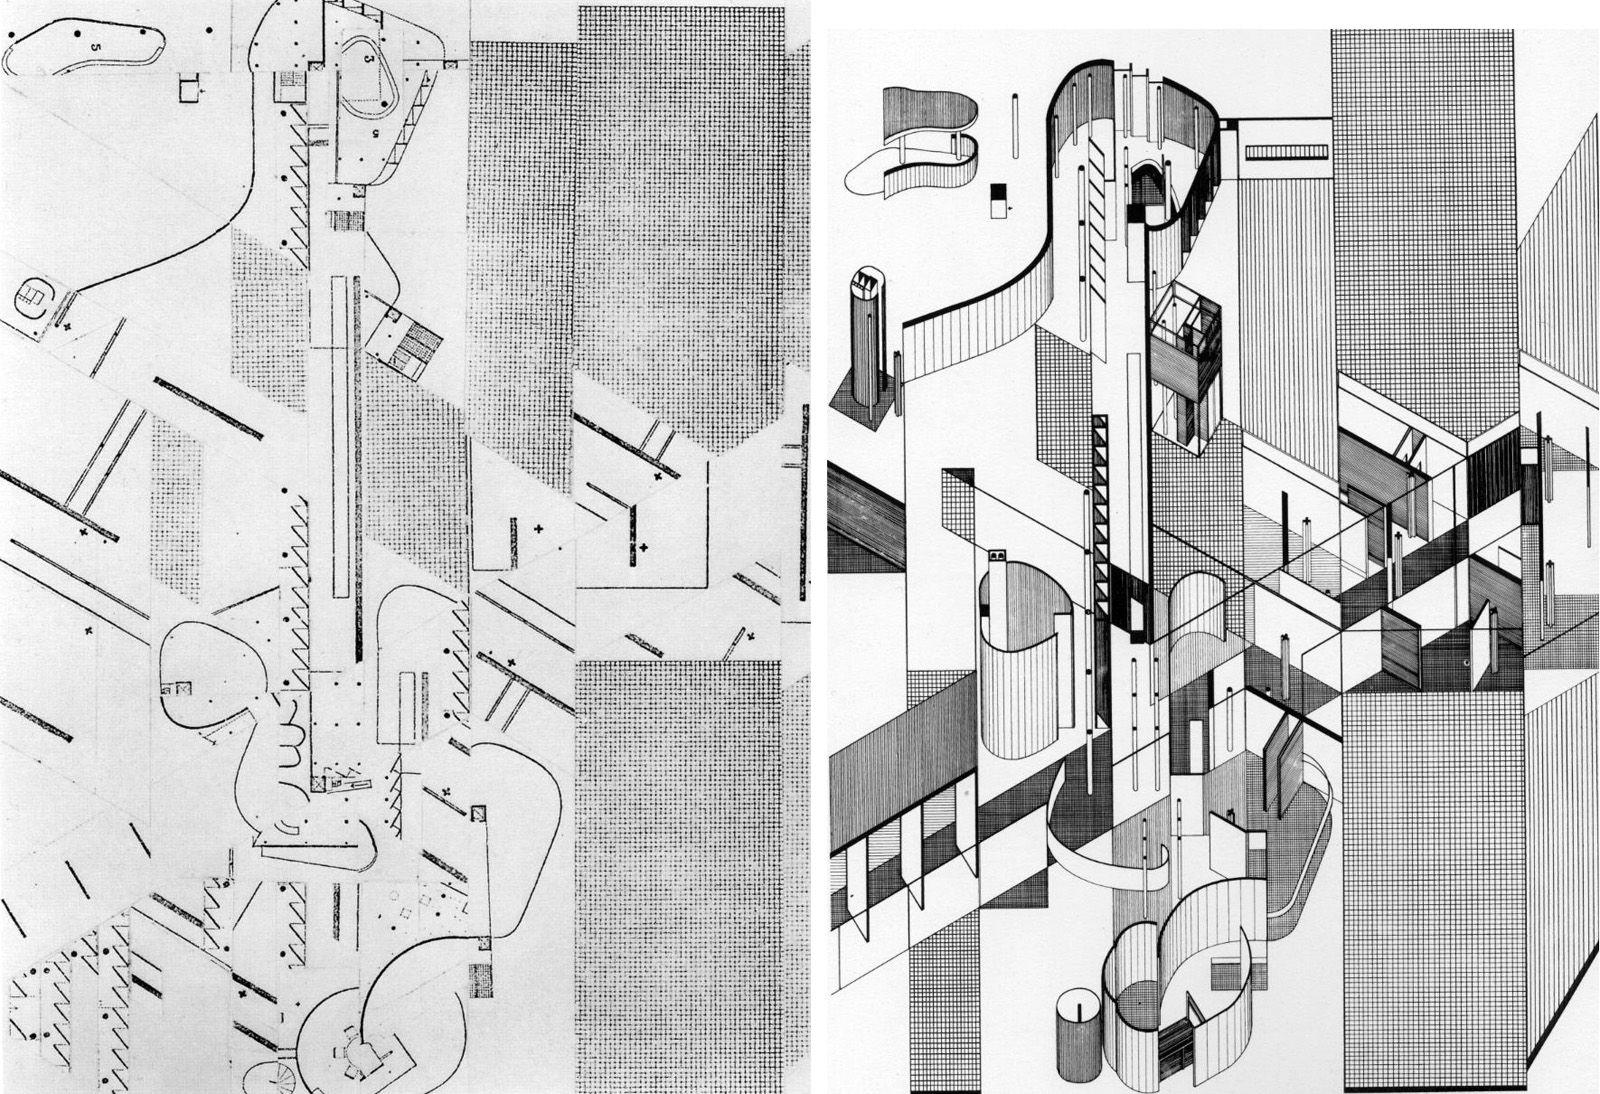 medium resolution of daniel libeskind gordon matta clark architecture student types of architecture architecture layout